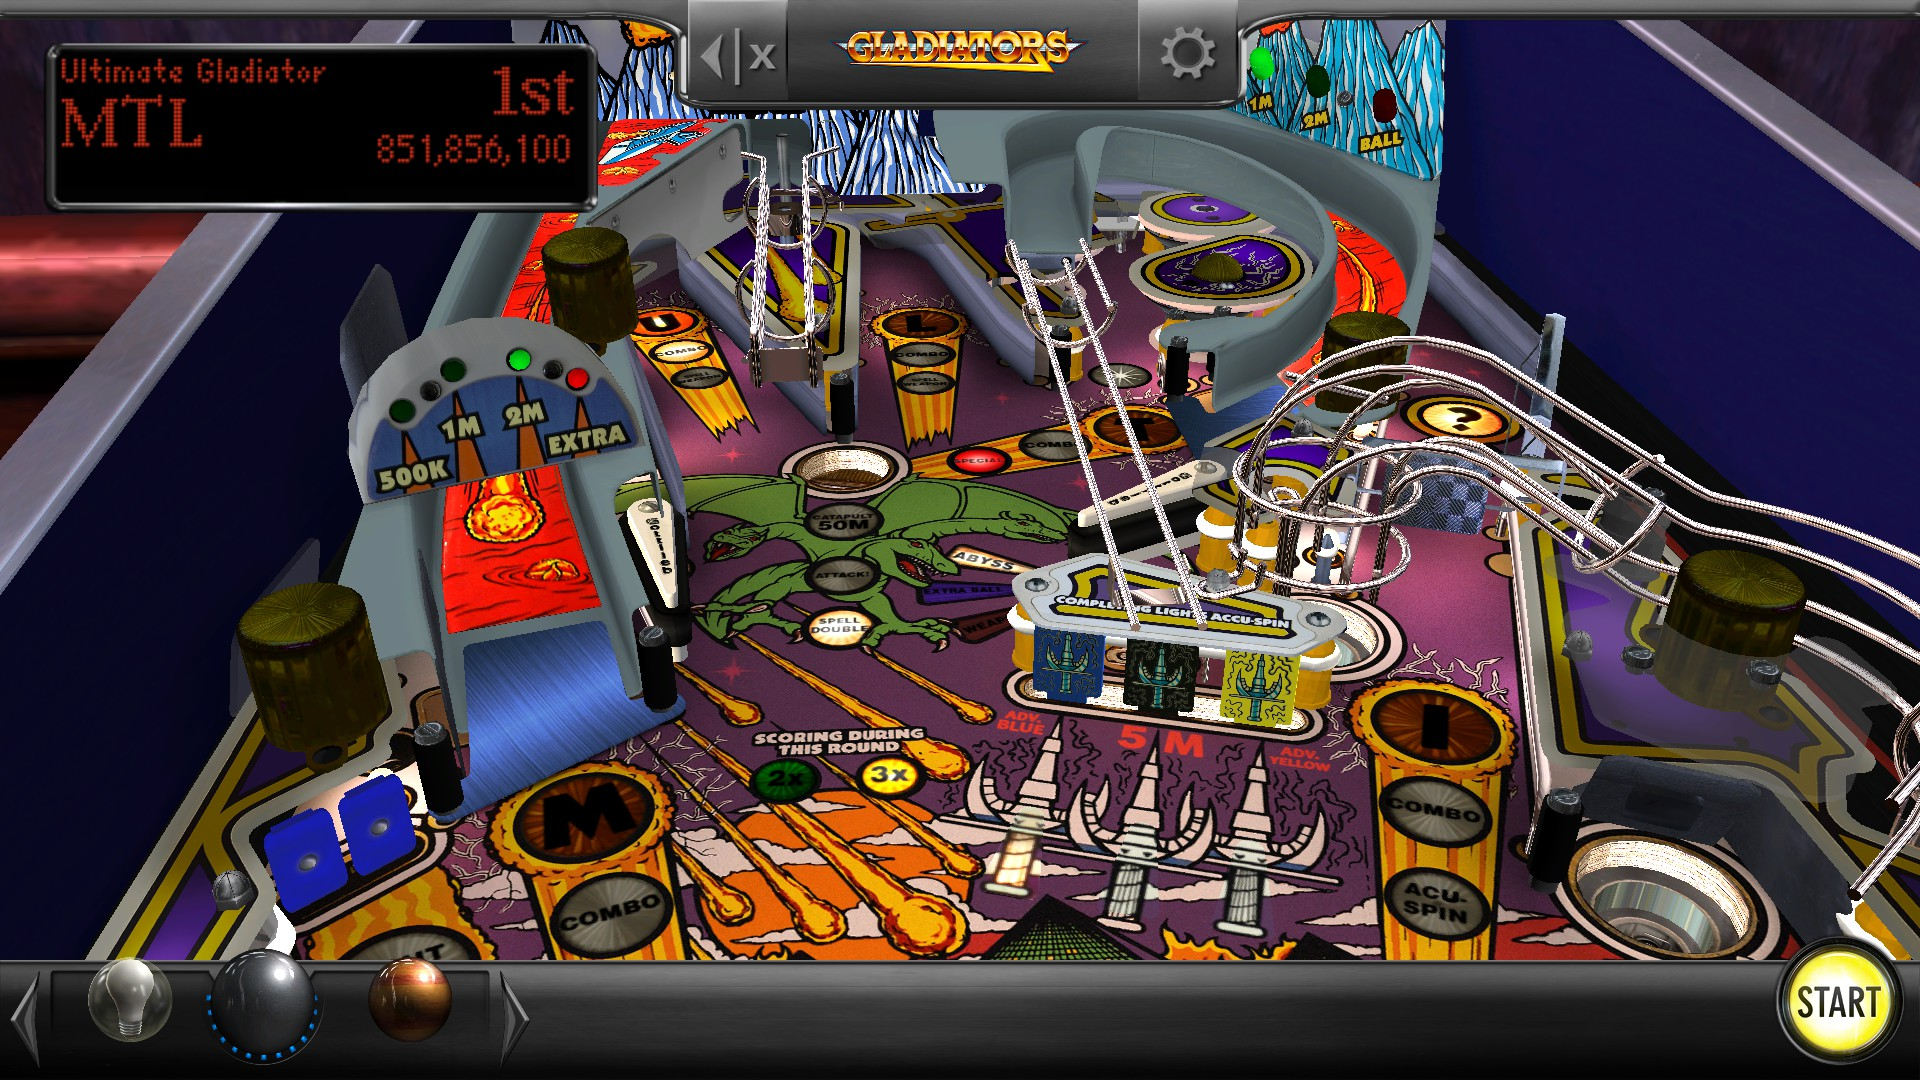 Mantalow: Pinball Arcade: Gladiators (PC) 851,856,100 points on 2017-01-31 03:38:42